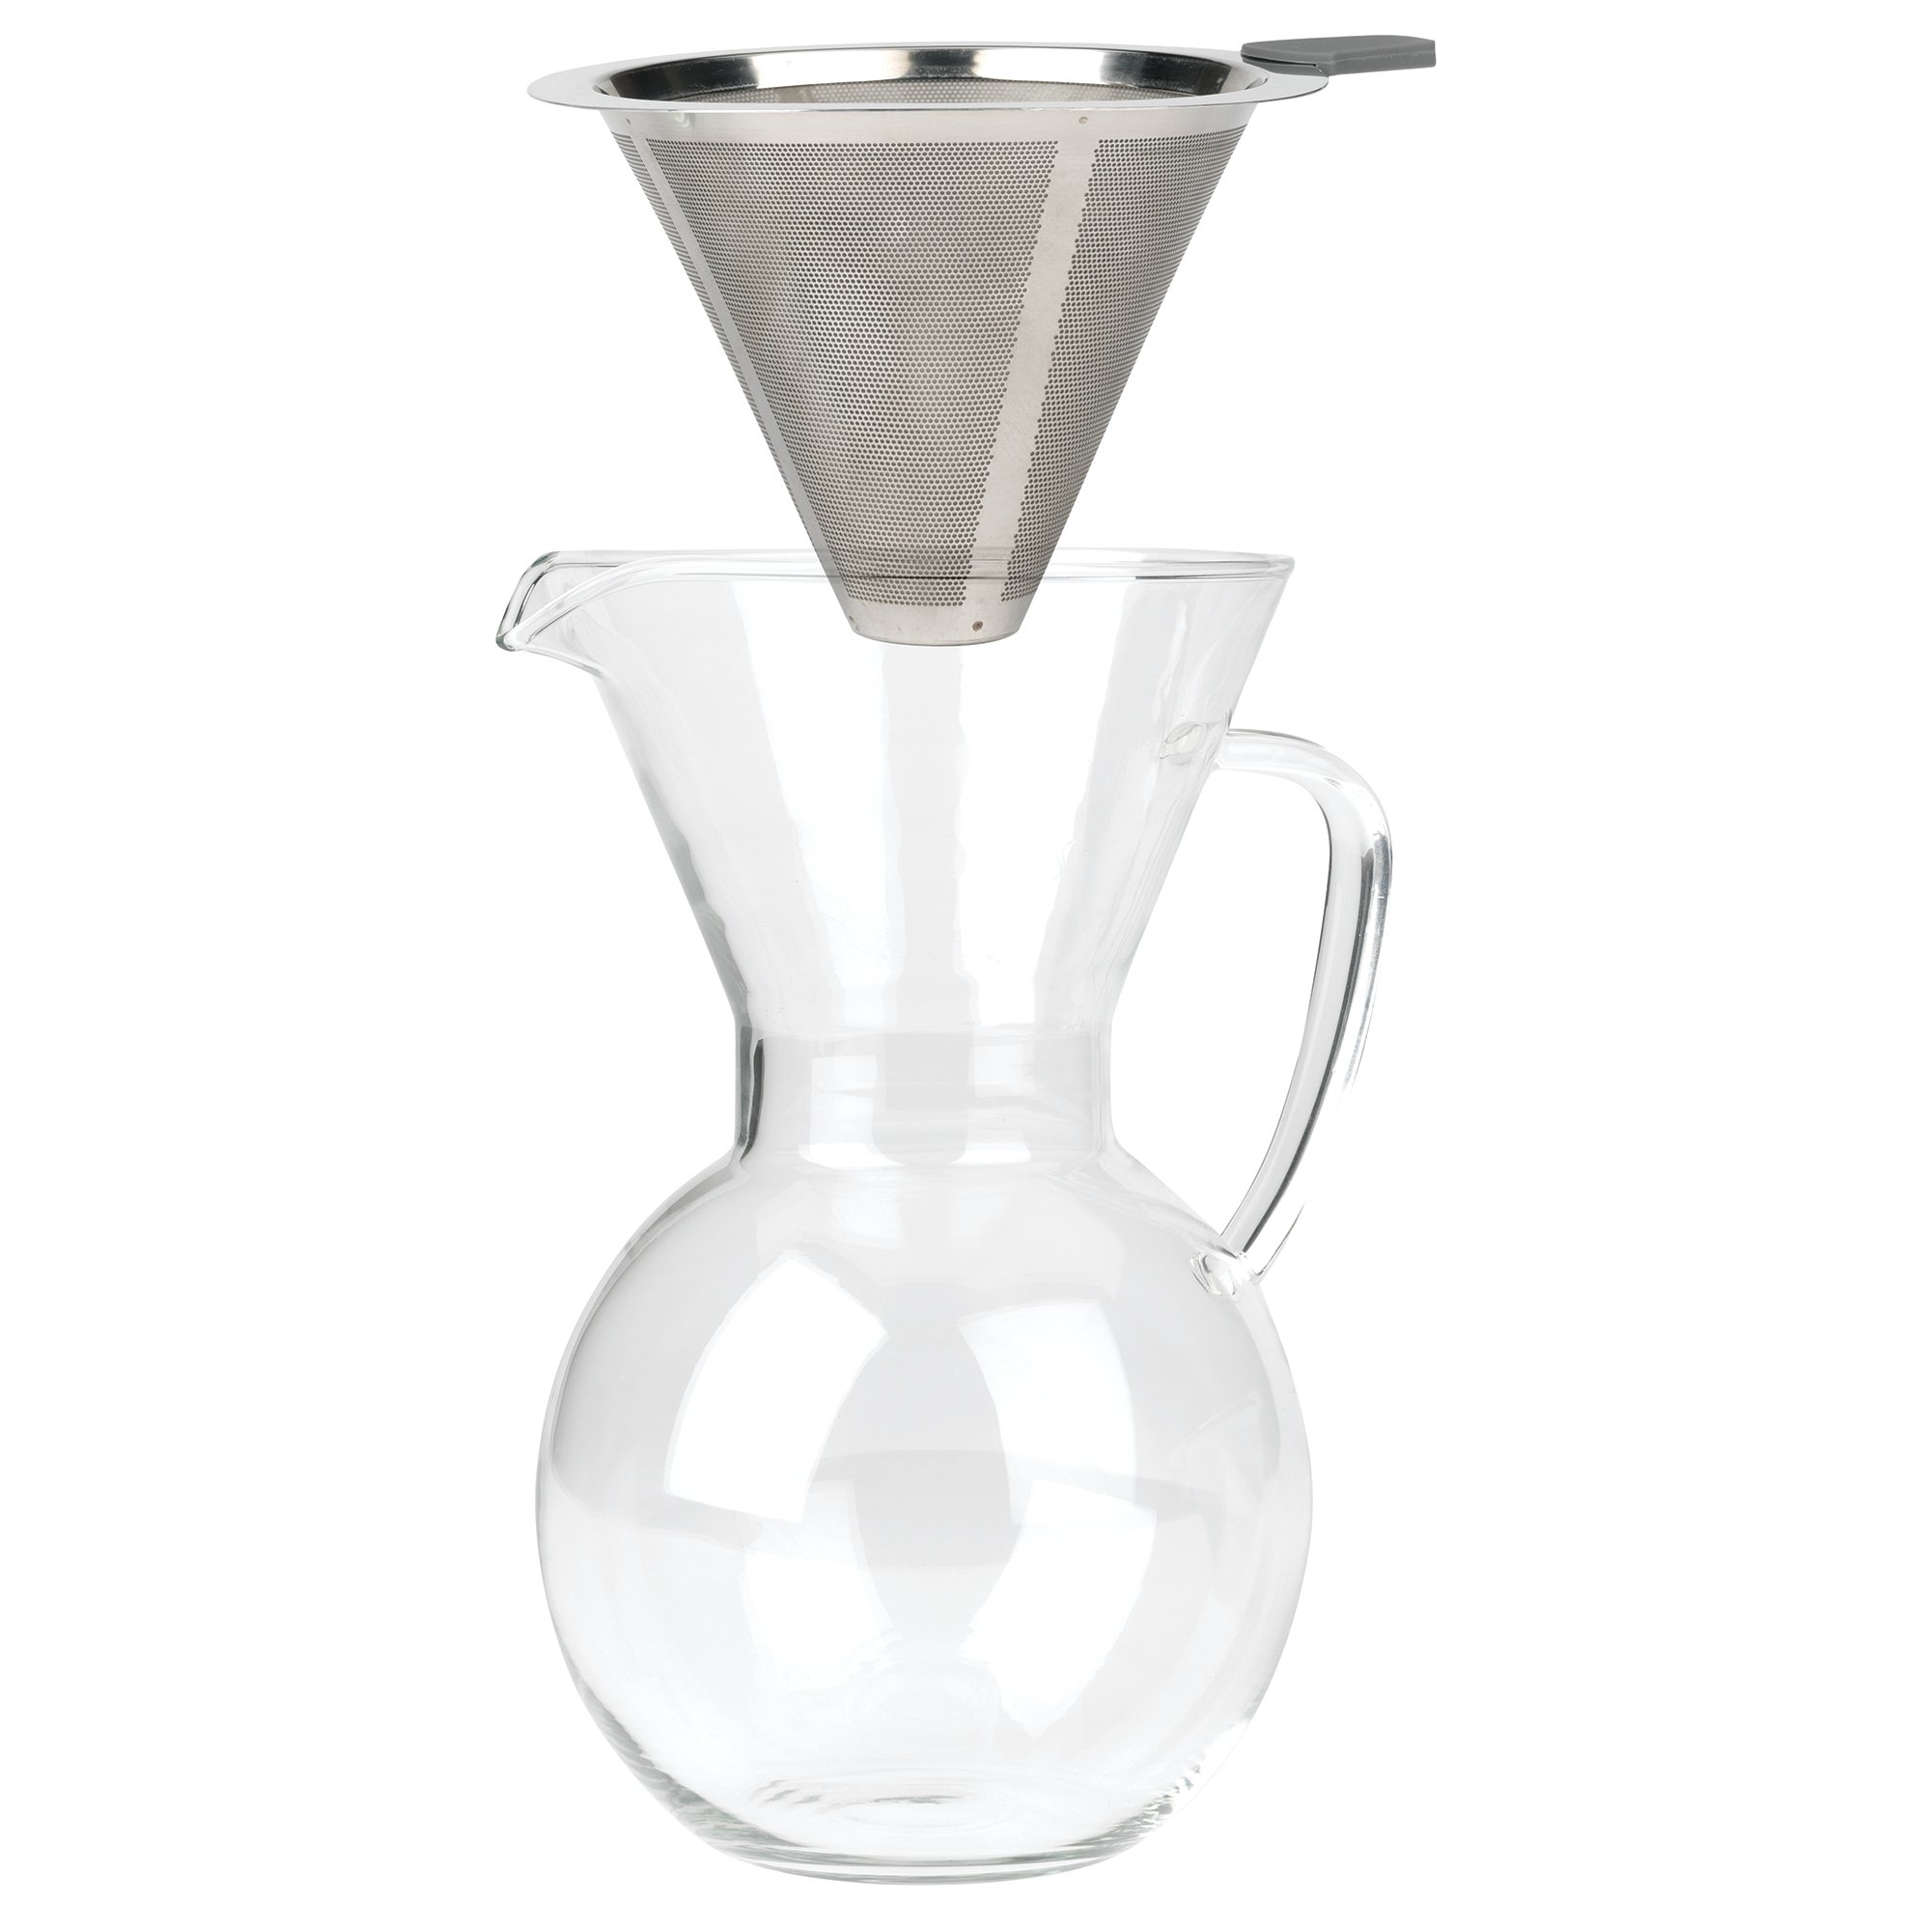 Bailetti Pourover Drip Coffee with Glass Carafe